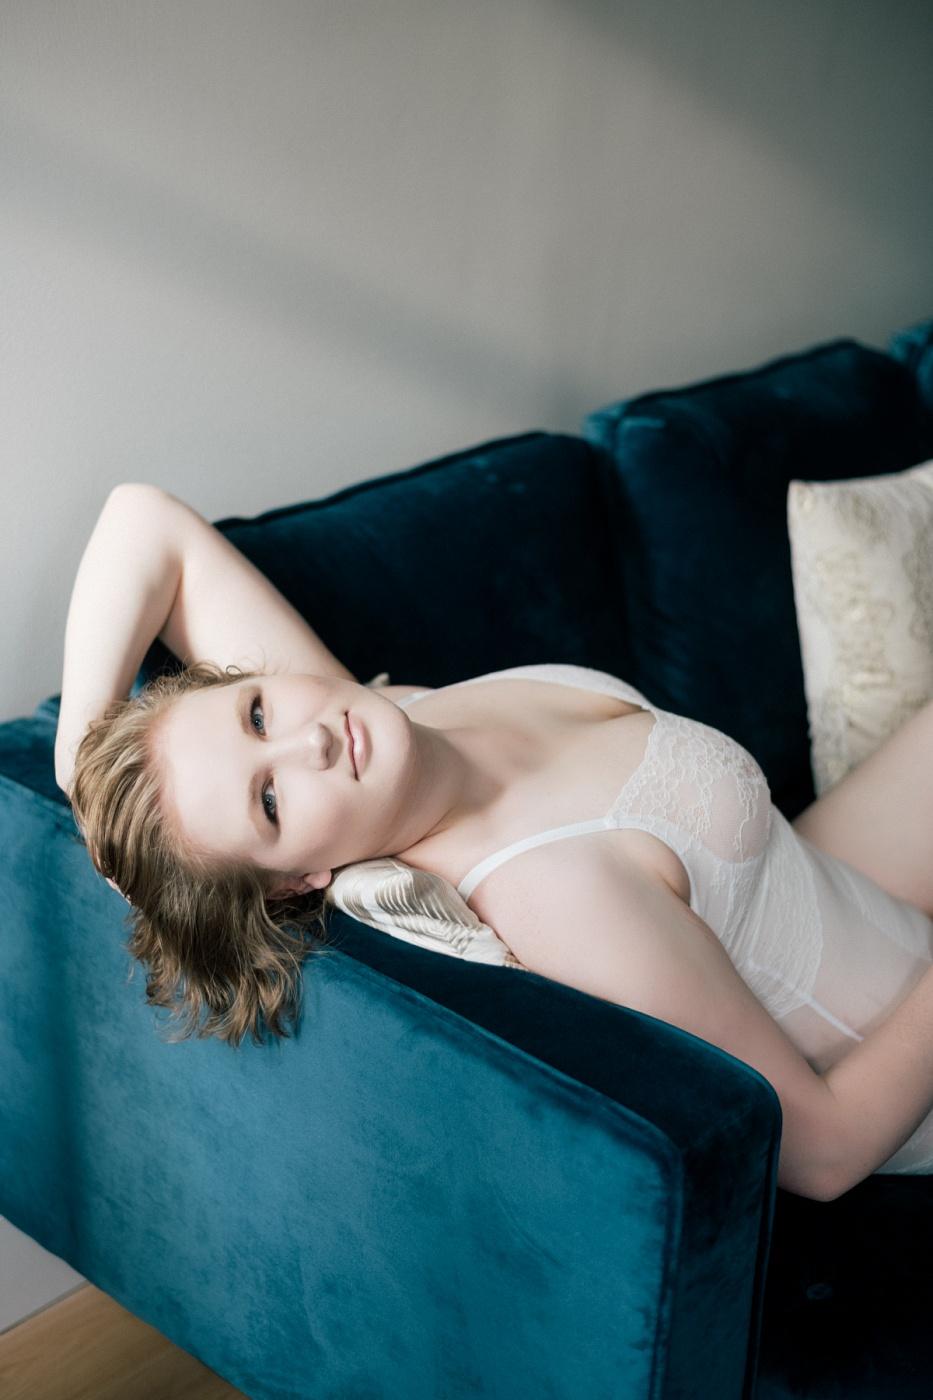 Natalya, Voluptuous Vixen